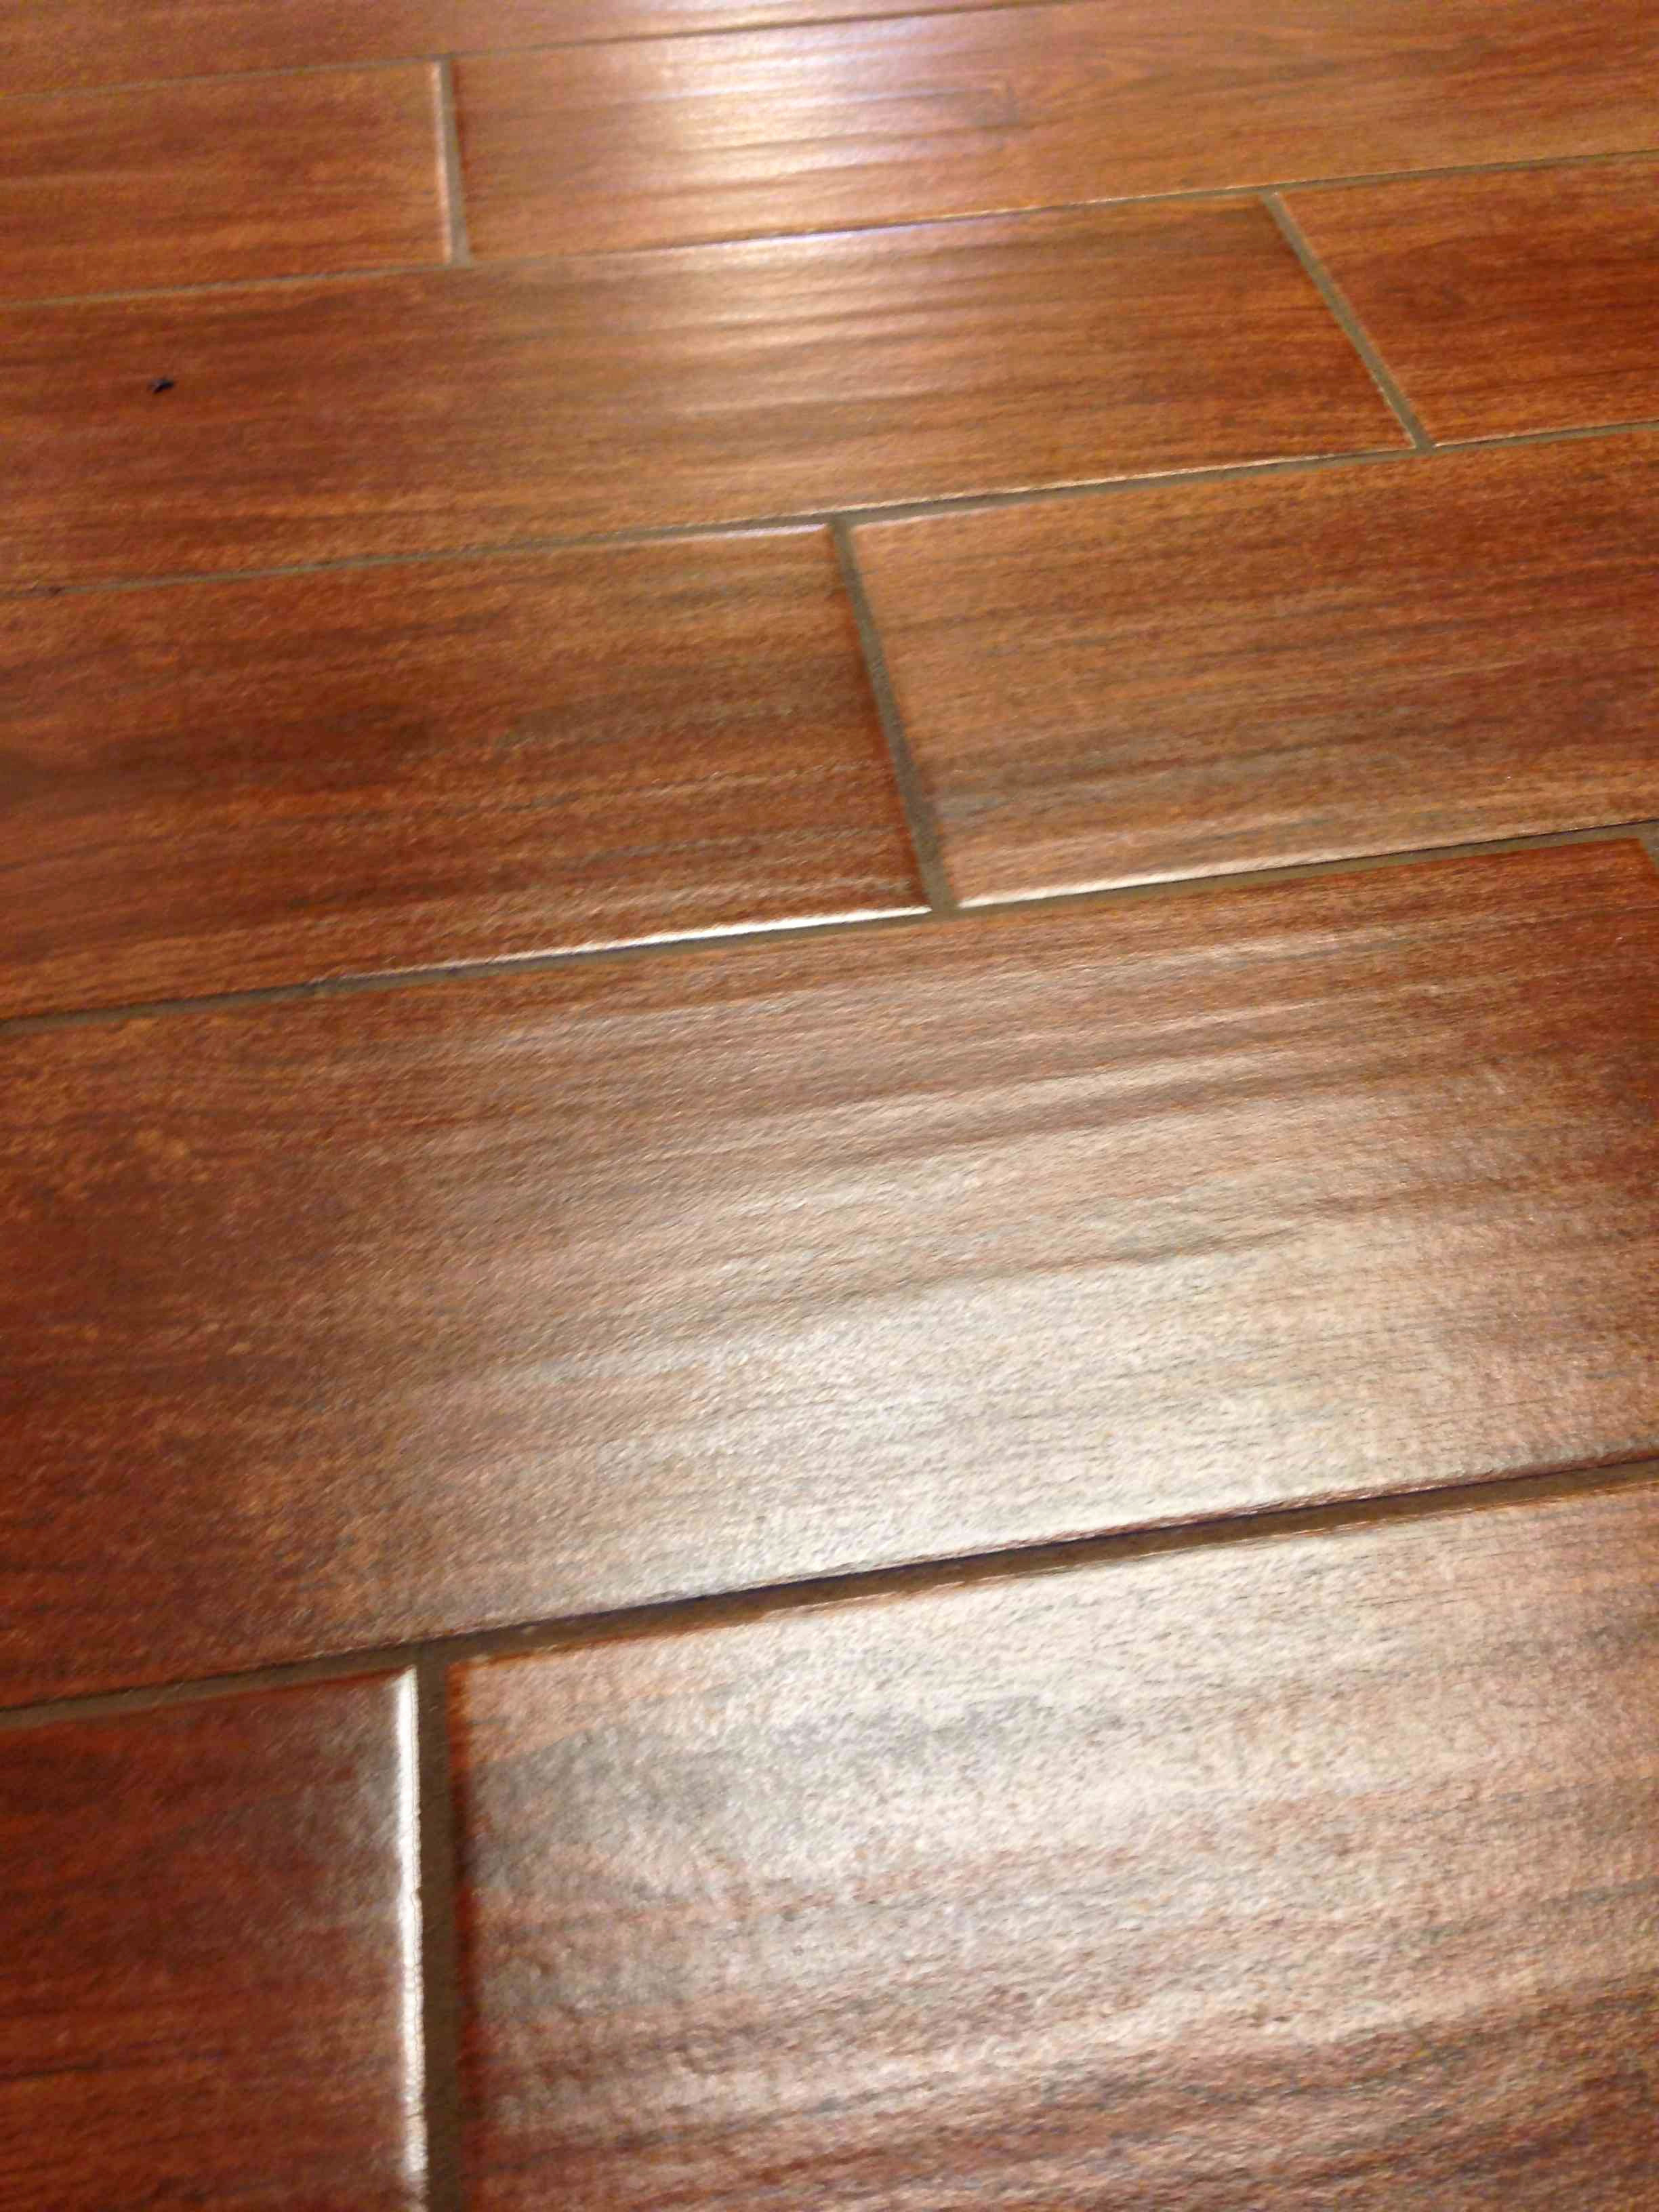 hardwood flooring lengths of prefinished flooring rift quarter sawn white oak long length made in throughout harwood flooring best tile that looks like hardwood floors elegant i pinimg 736x 0d 7b